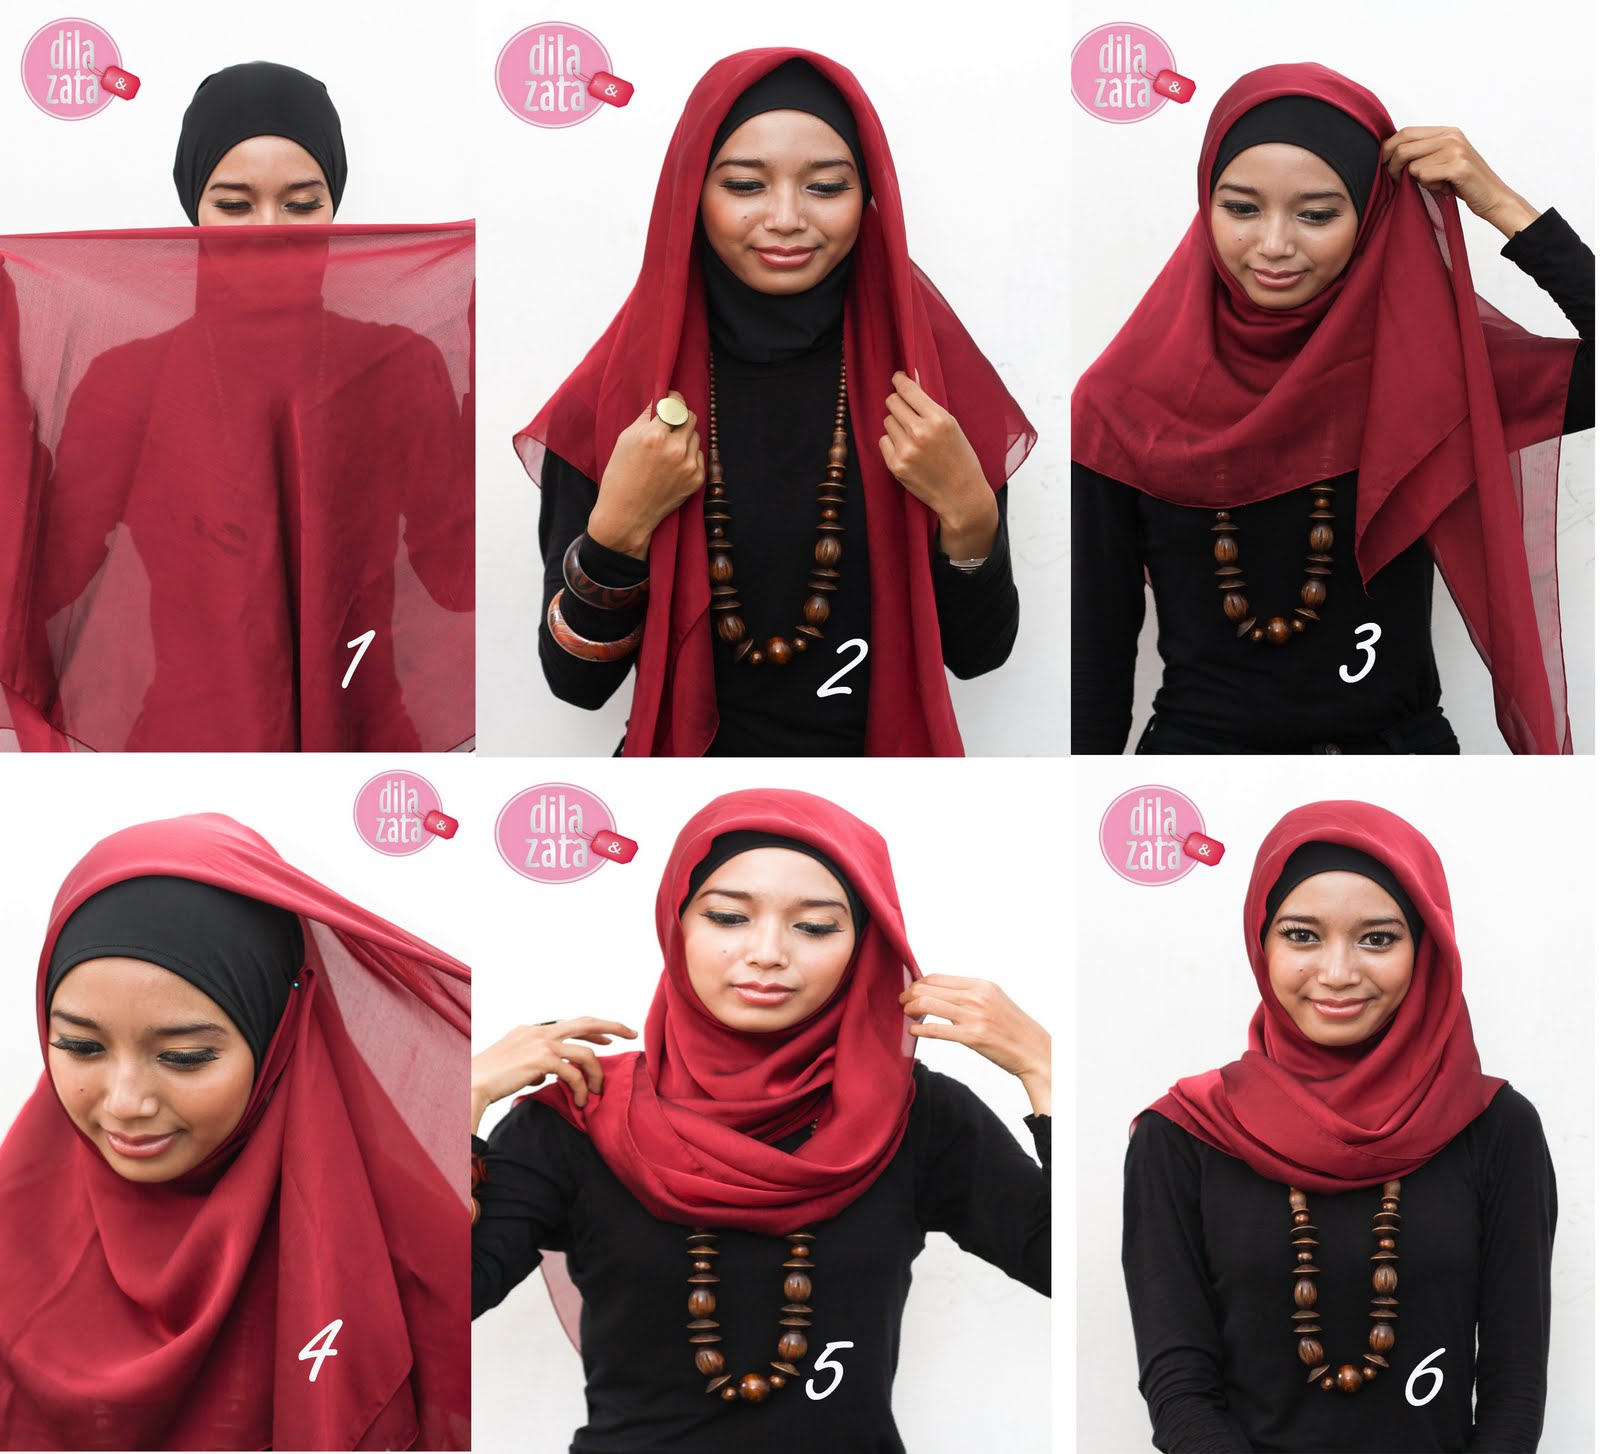 Как красиво завязать мусульманский платок на голову фото пошагово